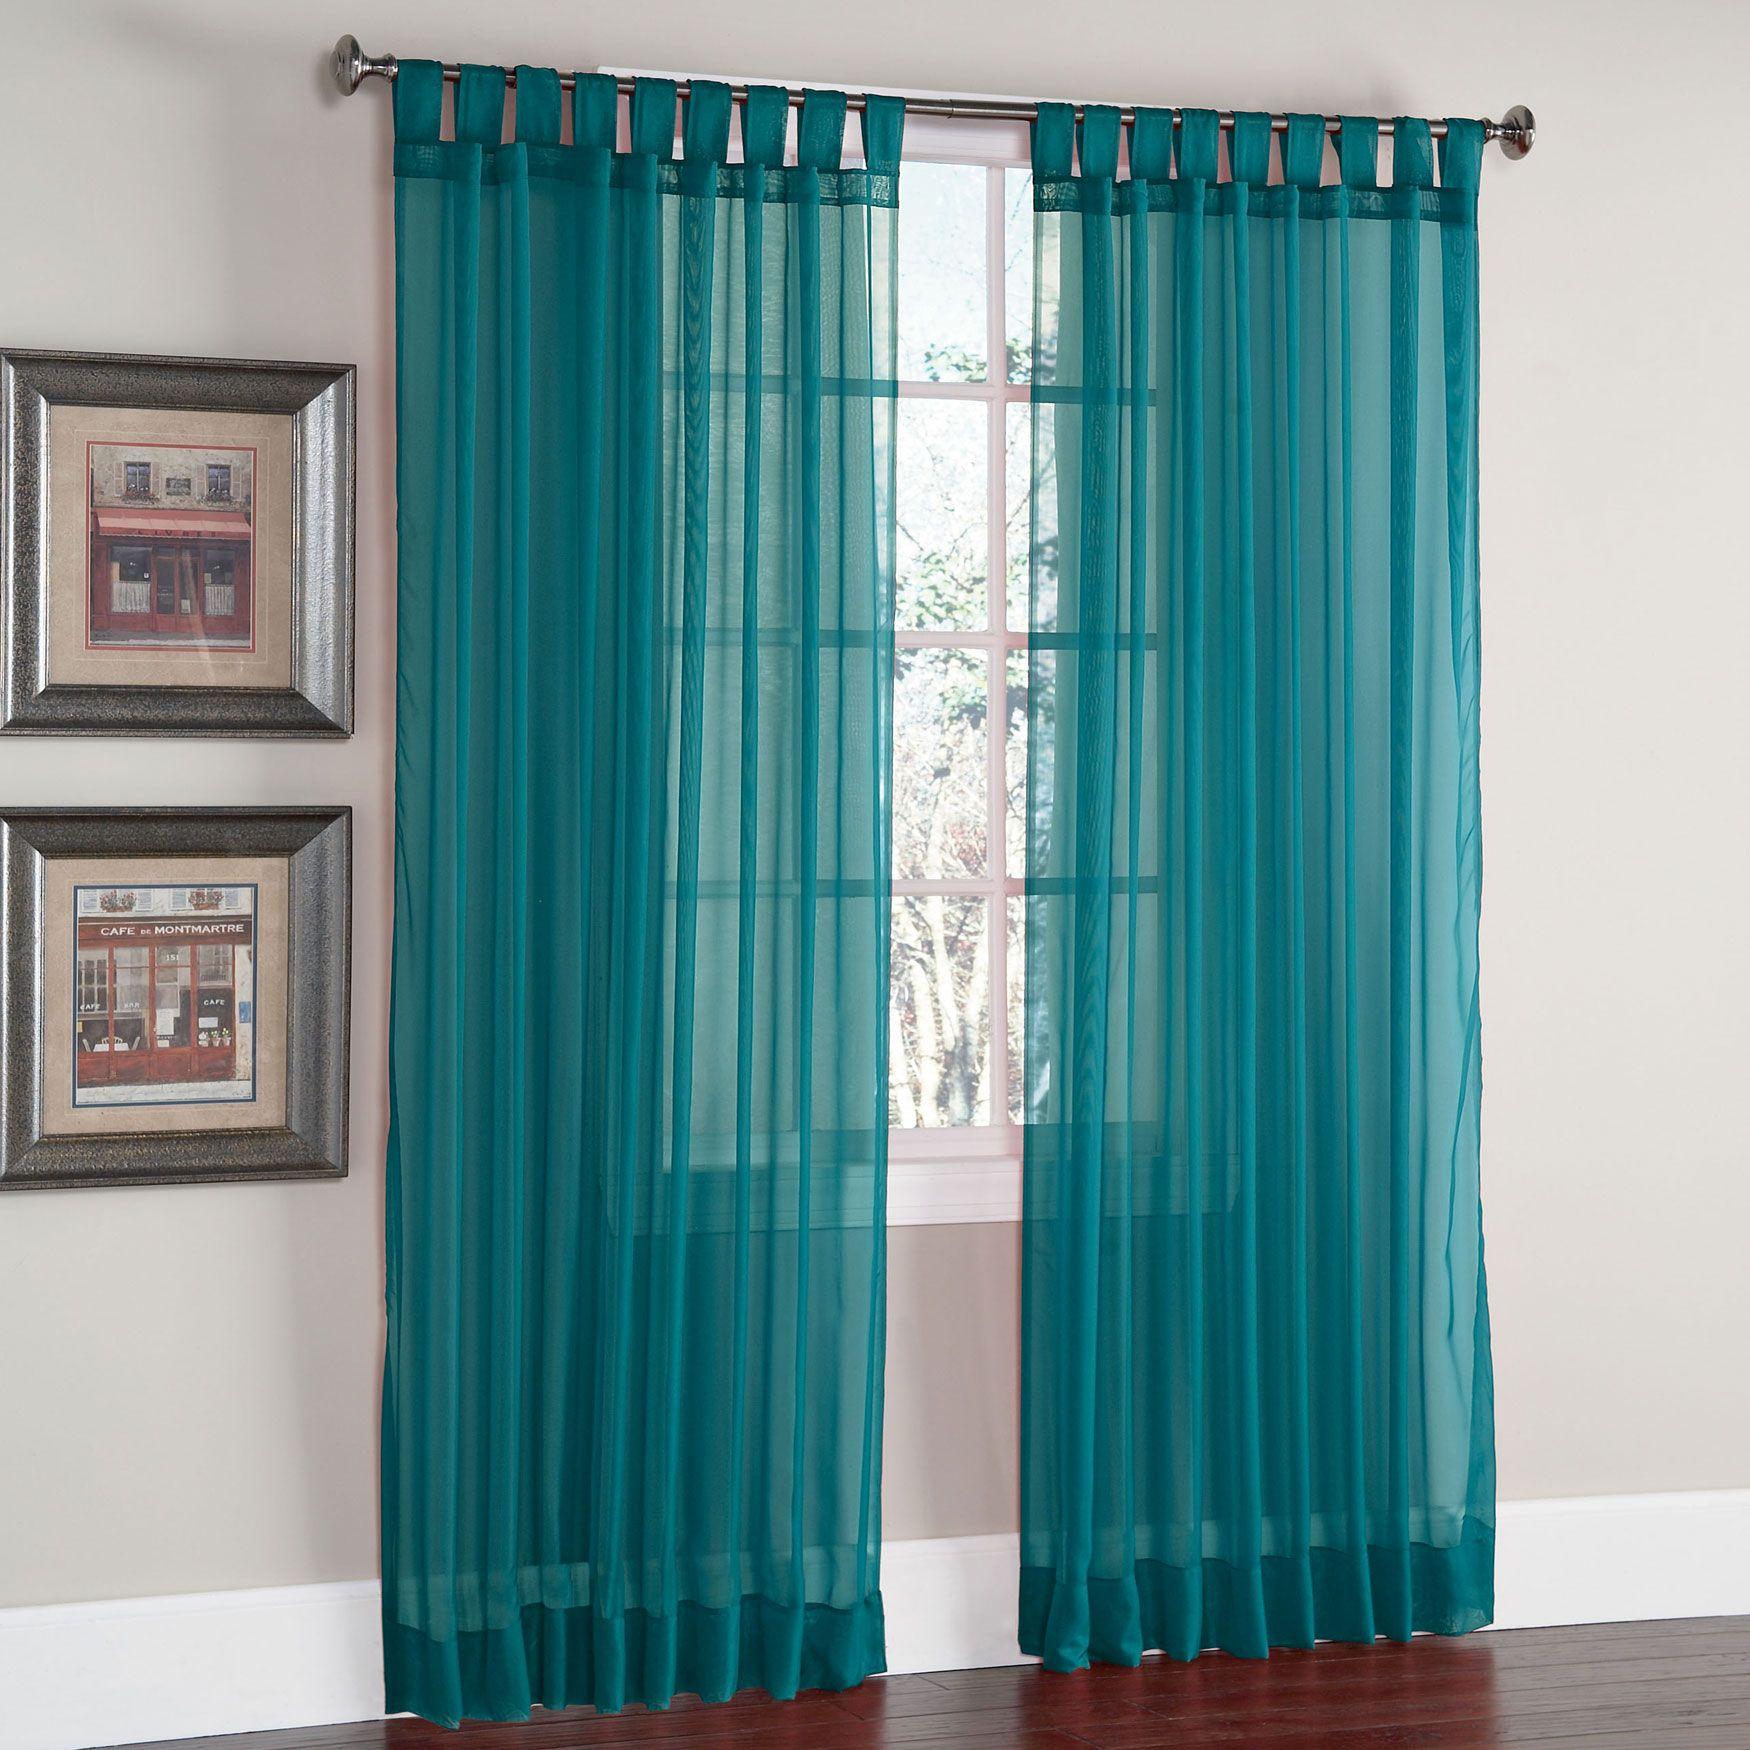 title | Teal Kitchen Window Curtains